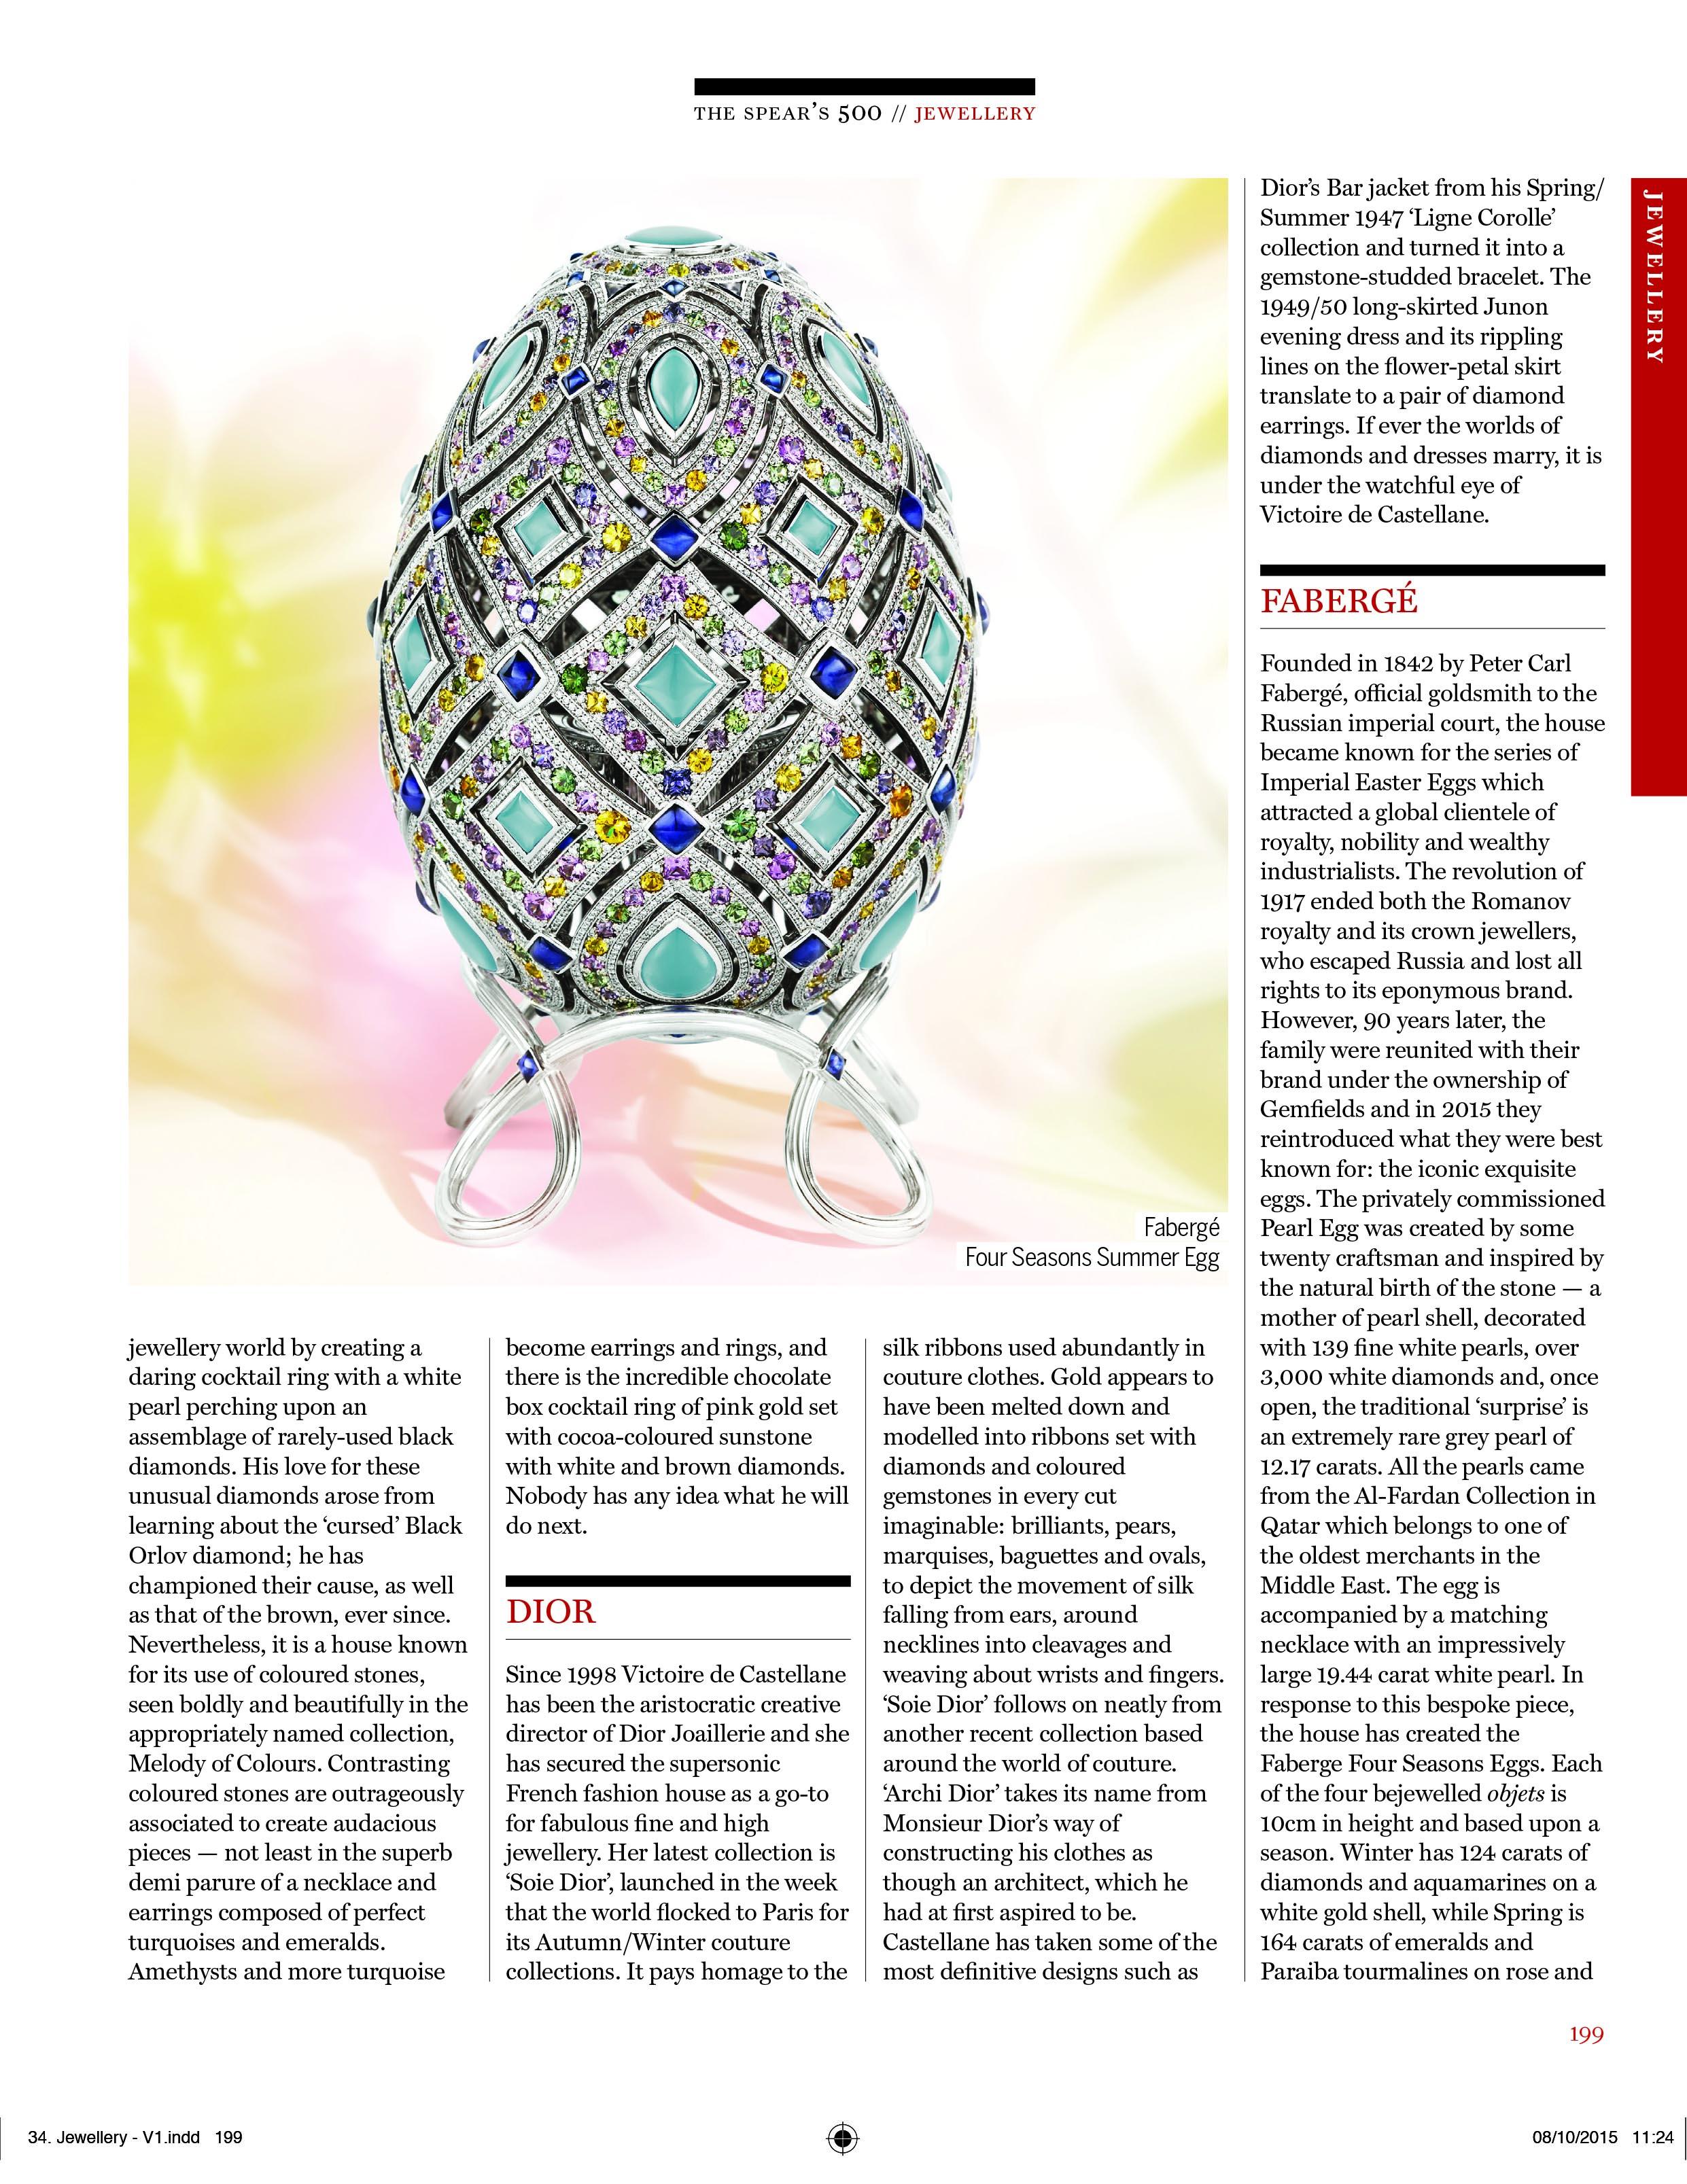 Josie-Goodbody-Jewellery-Articles